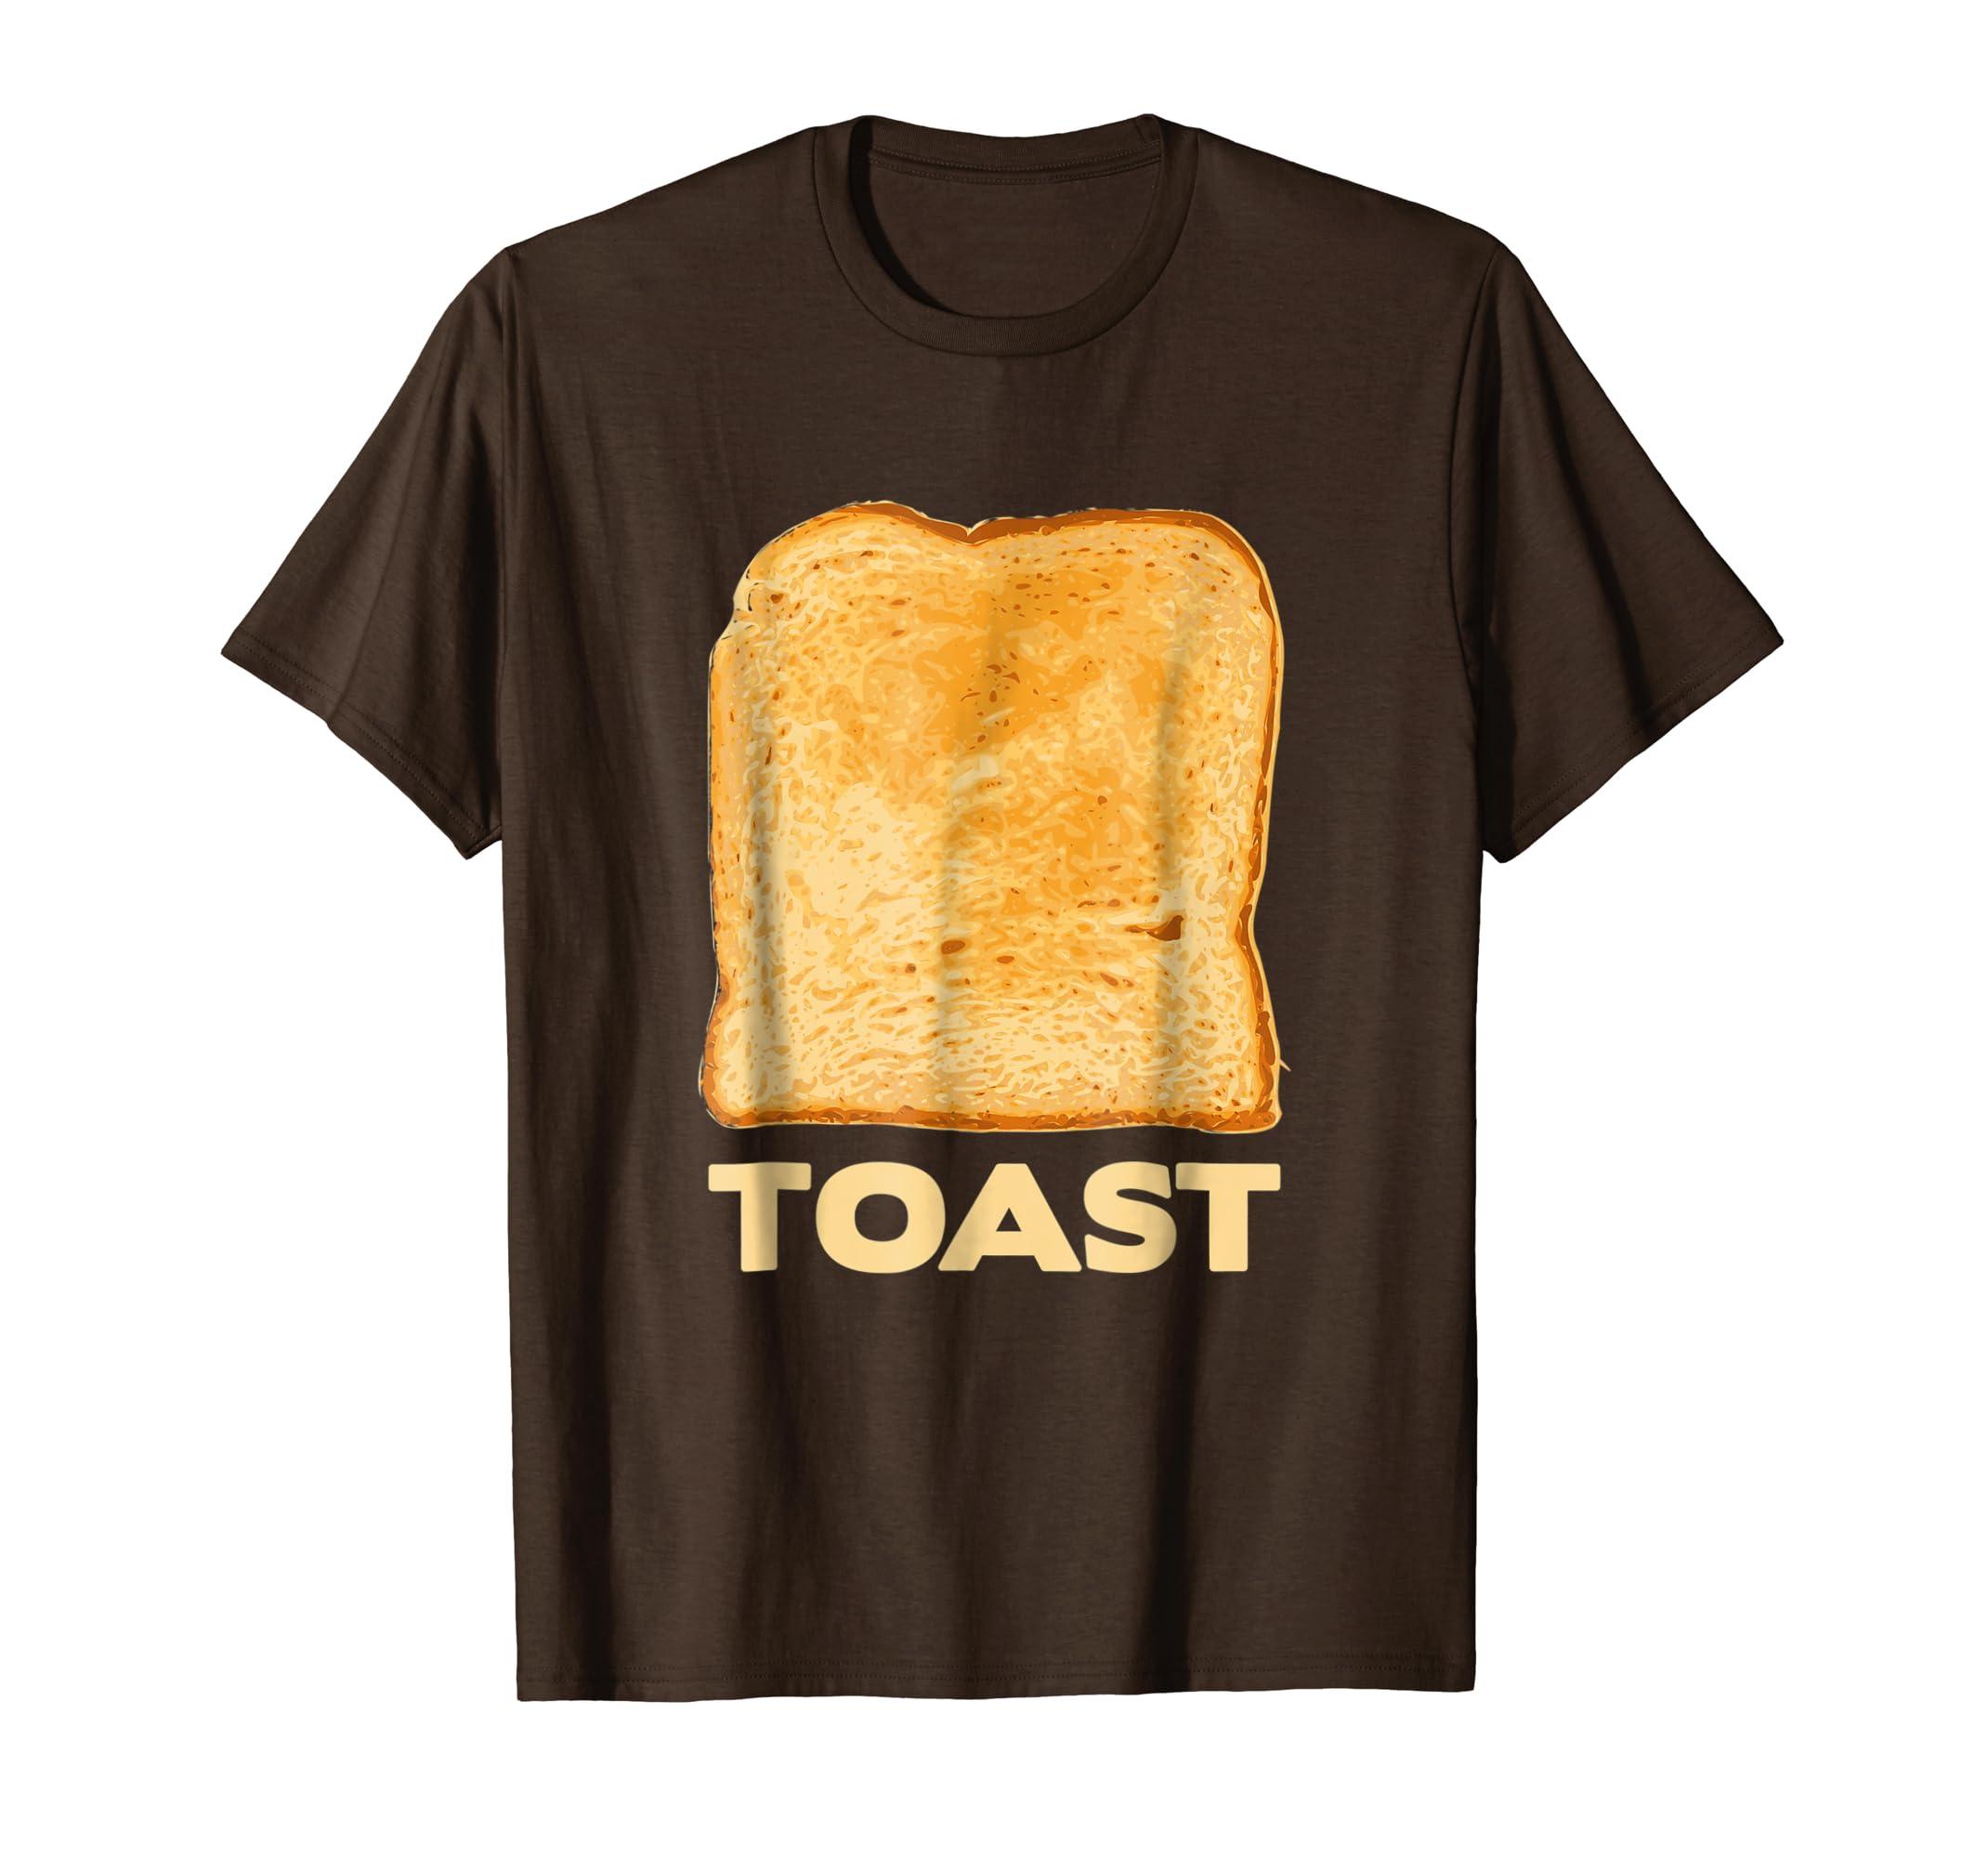 Avocado Toast Costume T Shirt Matching Halloween Costumes-Teechatpro